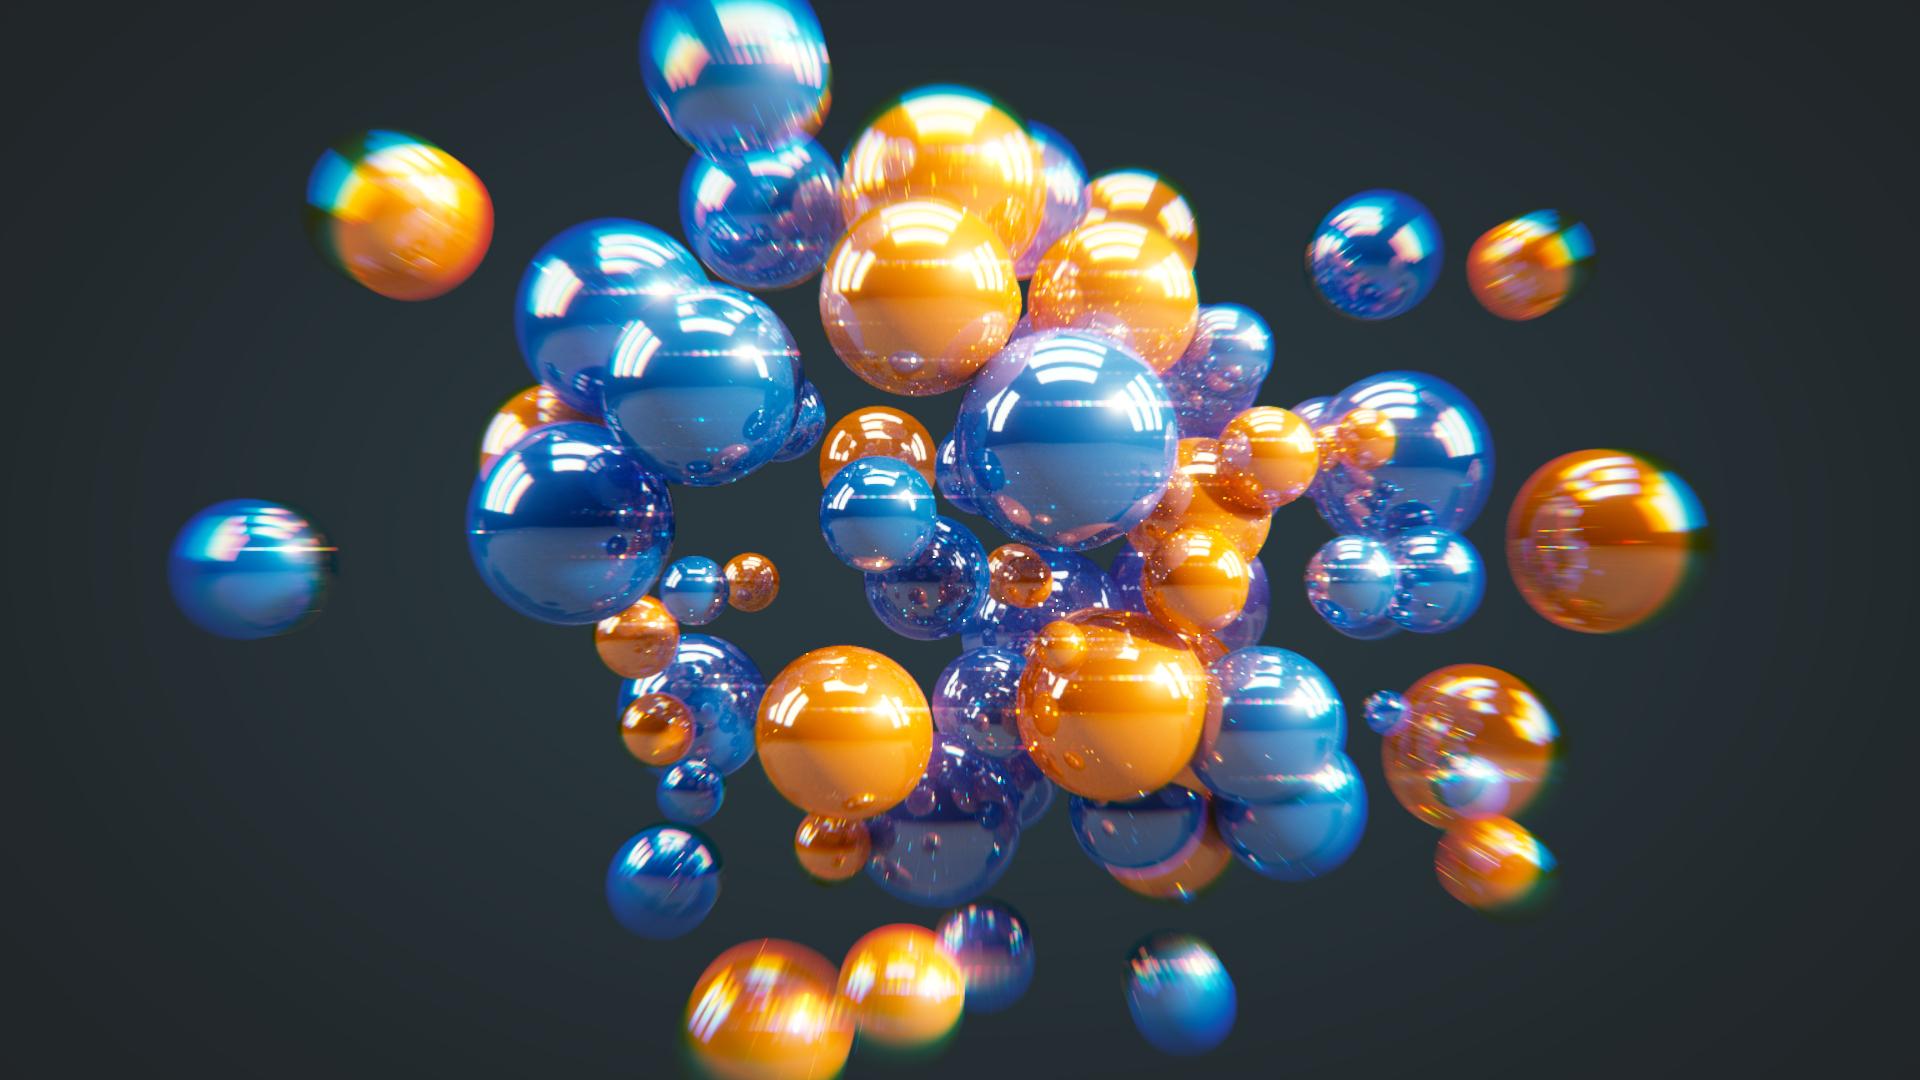 Bälle, Glanzgraden, 3D, Infografik, Blau, Orange - Wallpaper HD - Prof.-falken.com